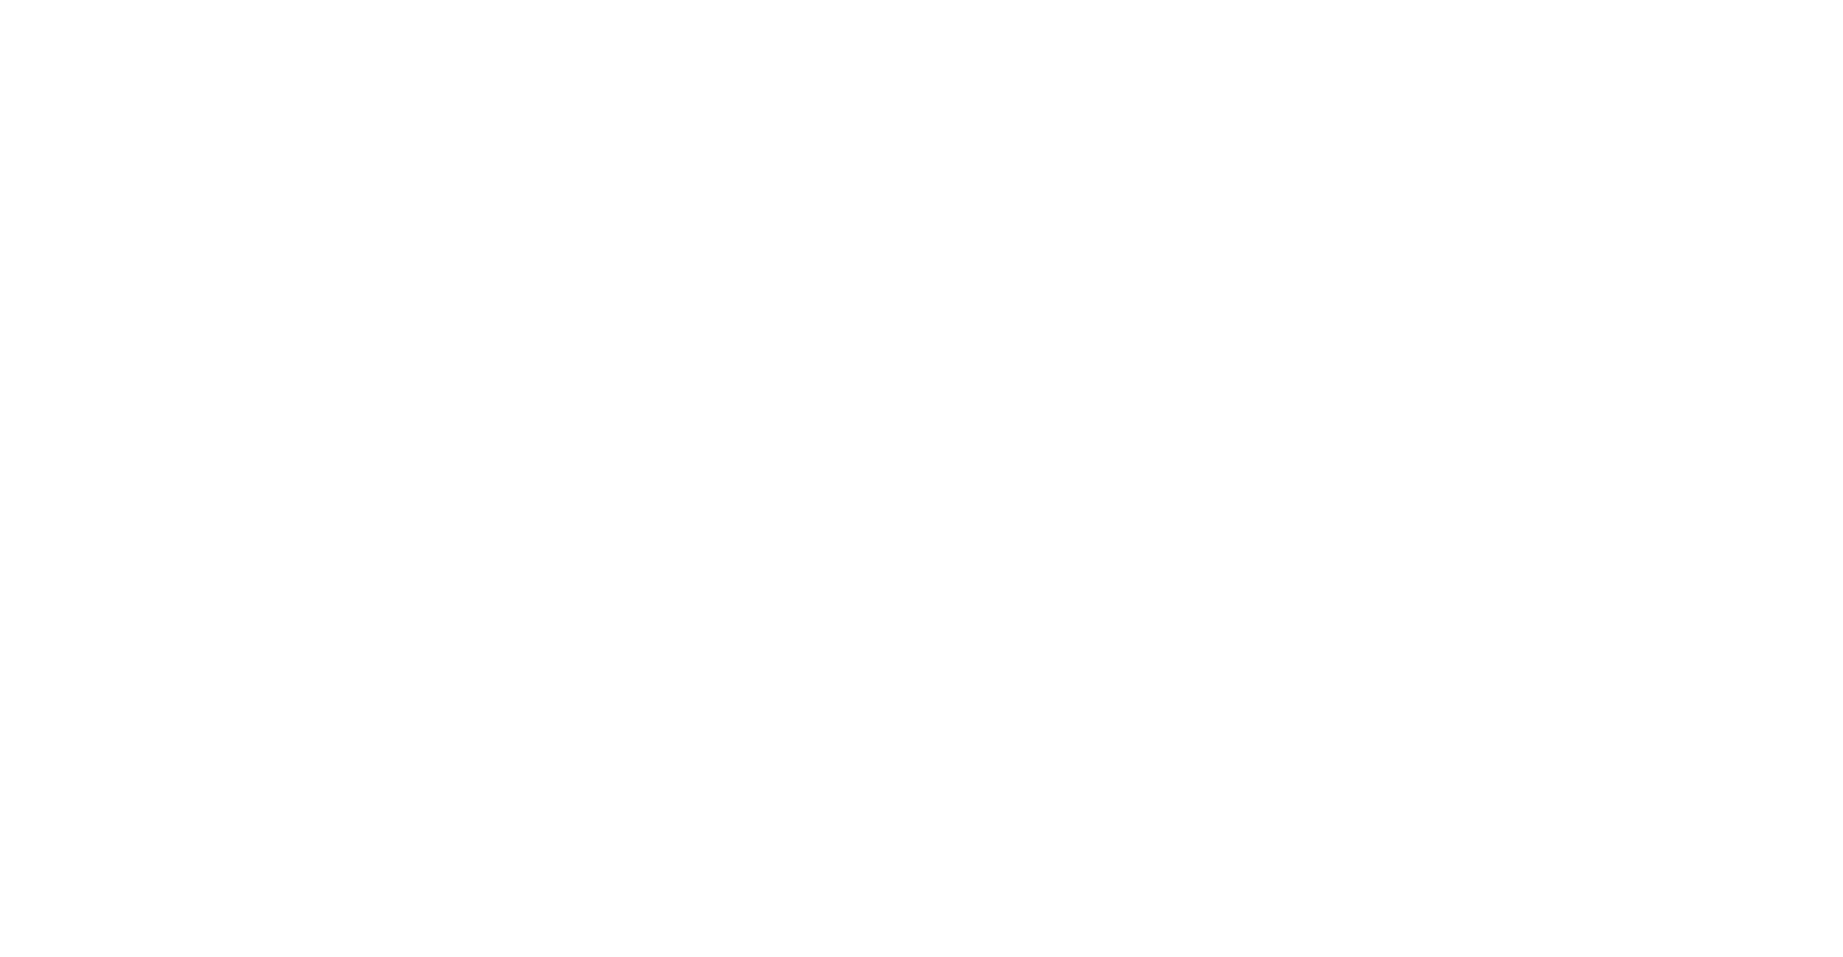 Malanico